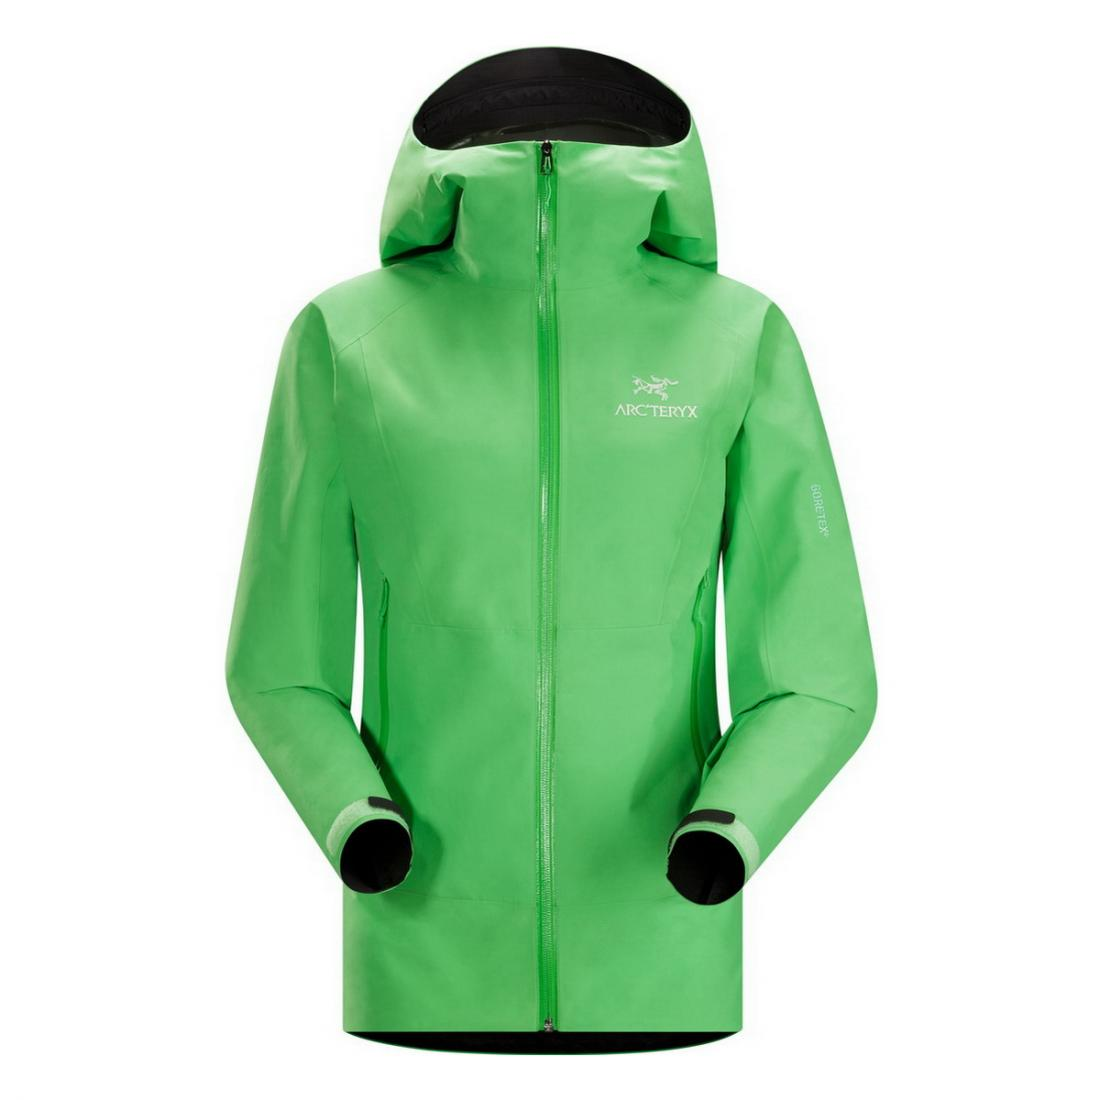 Куртка Beta SL жен.Куртки<br><br><br>Цвет: Зеленый<br>Размер: S